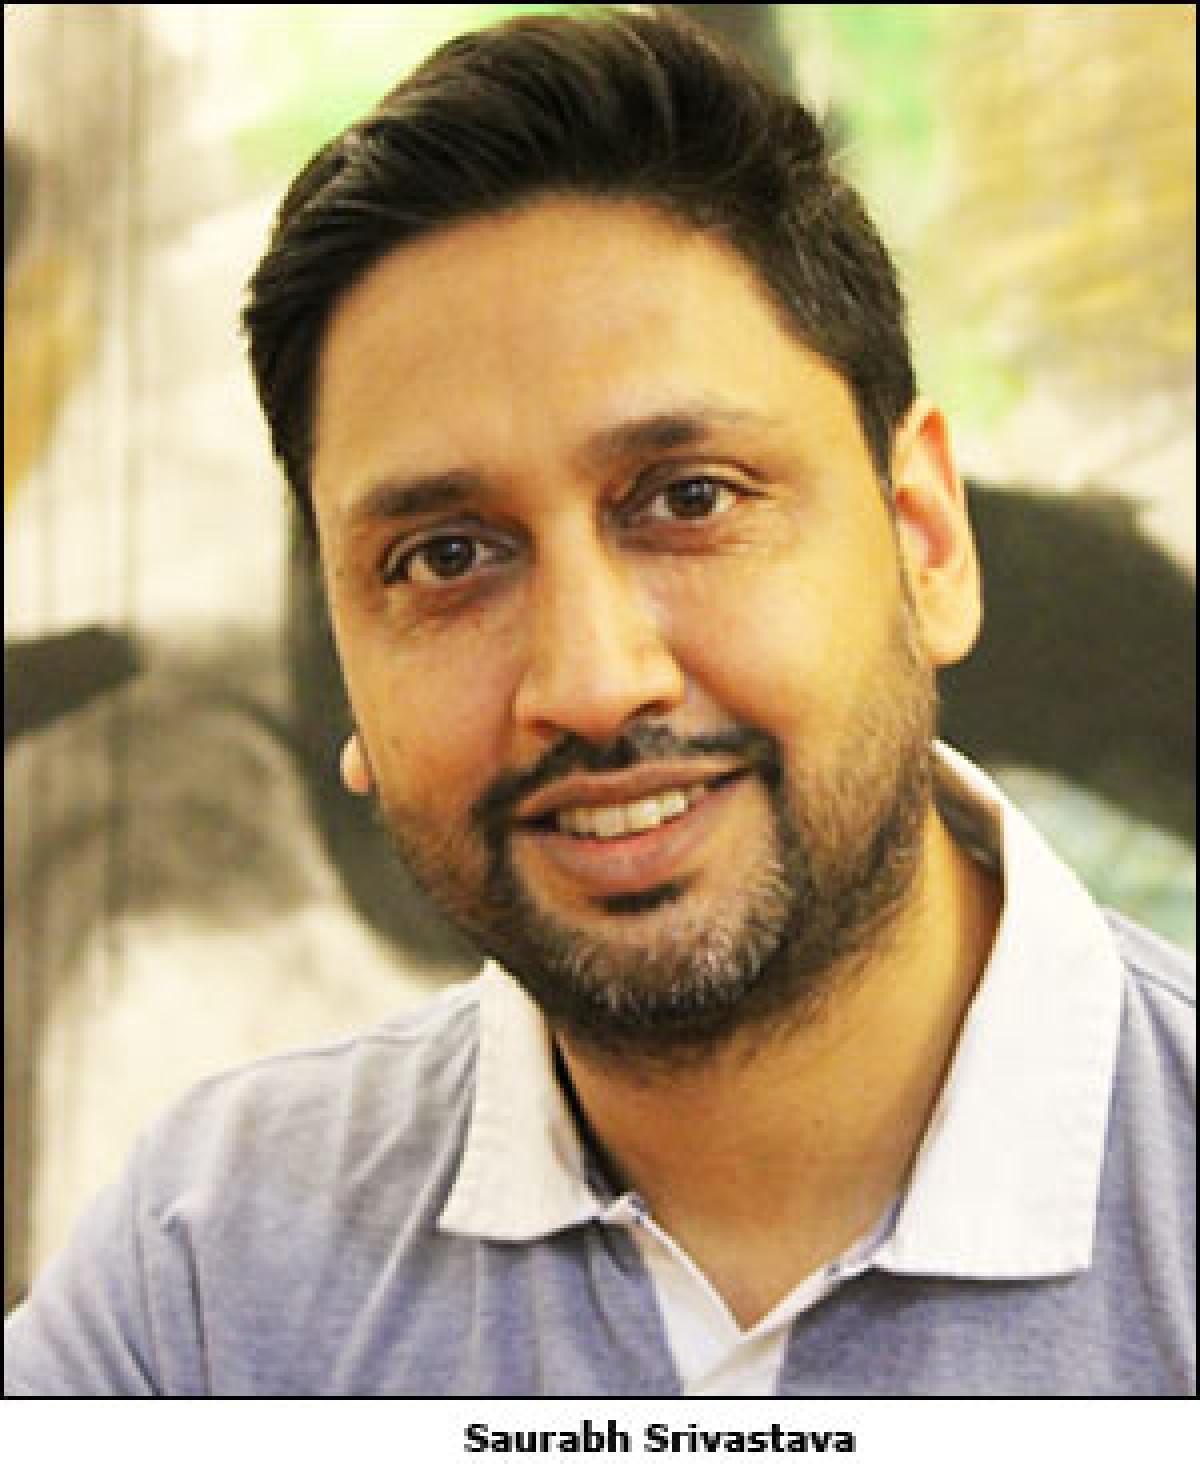 """Our aim is to make physical wallets redundant"": Saurabh Srivastava, CMO, MobiKwik"